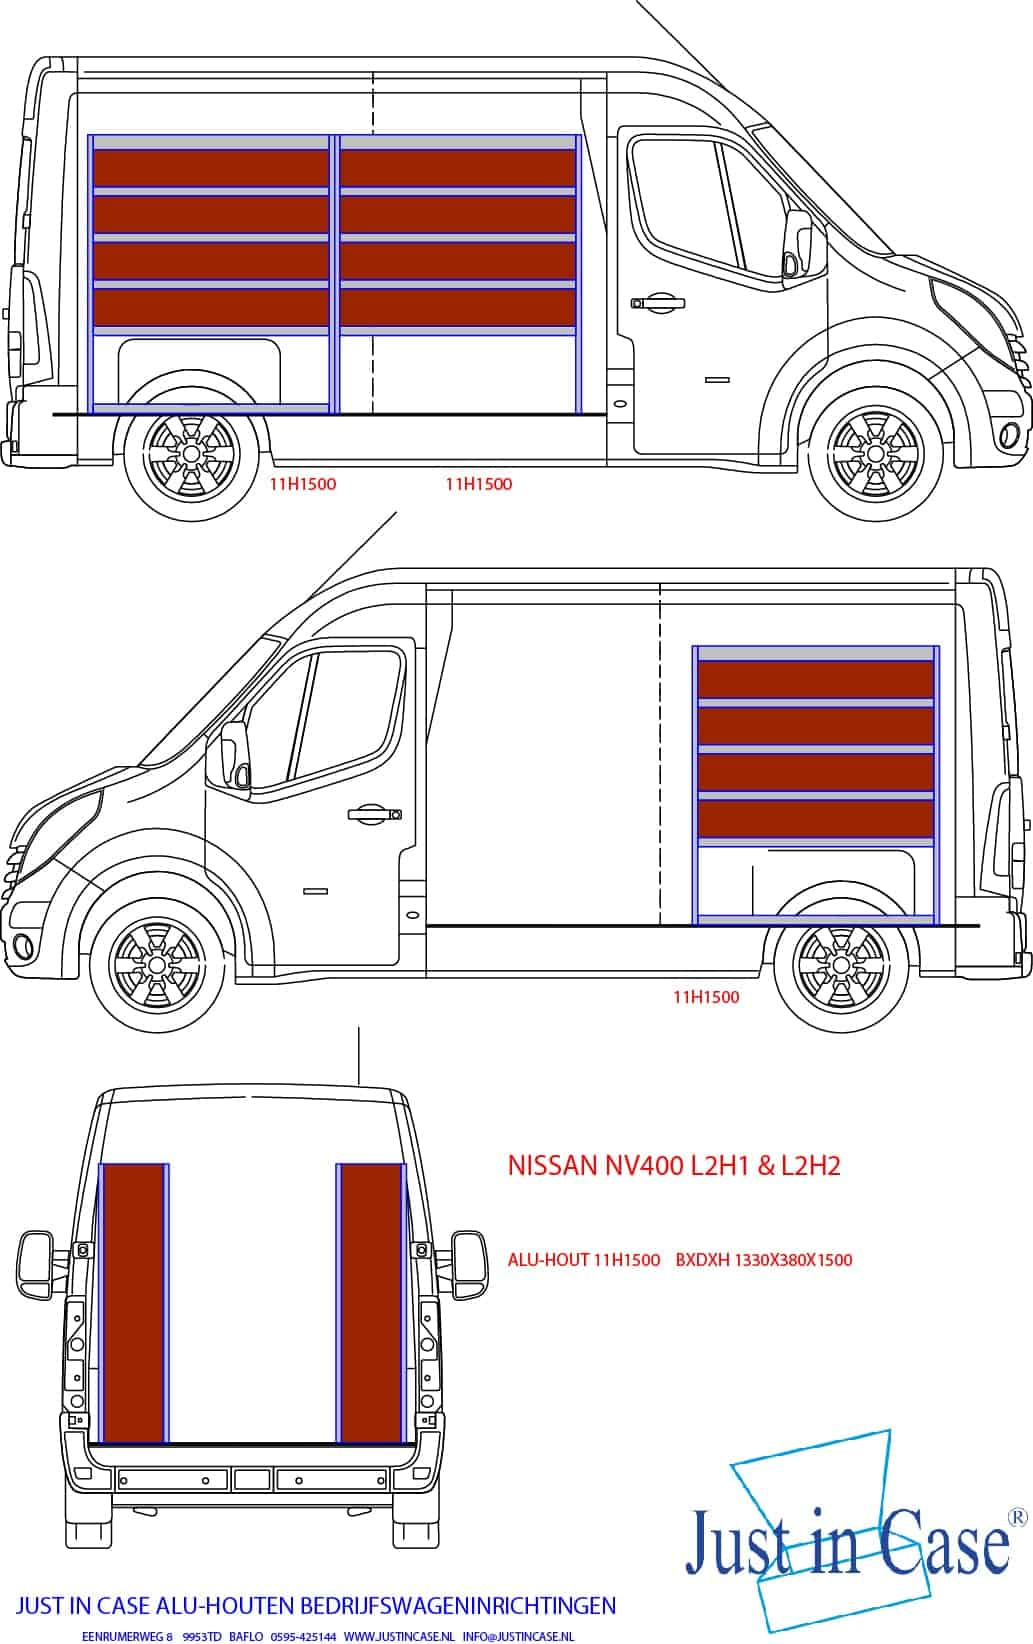 Nissan NV400 (L2) bedrijfswagen inrichten schets